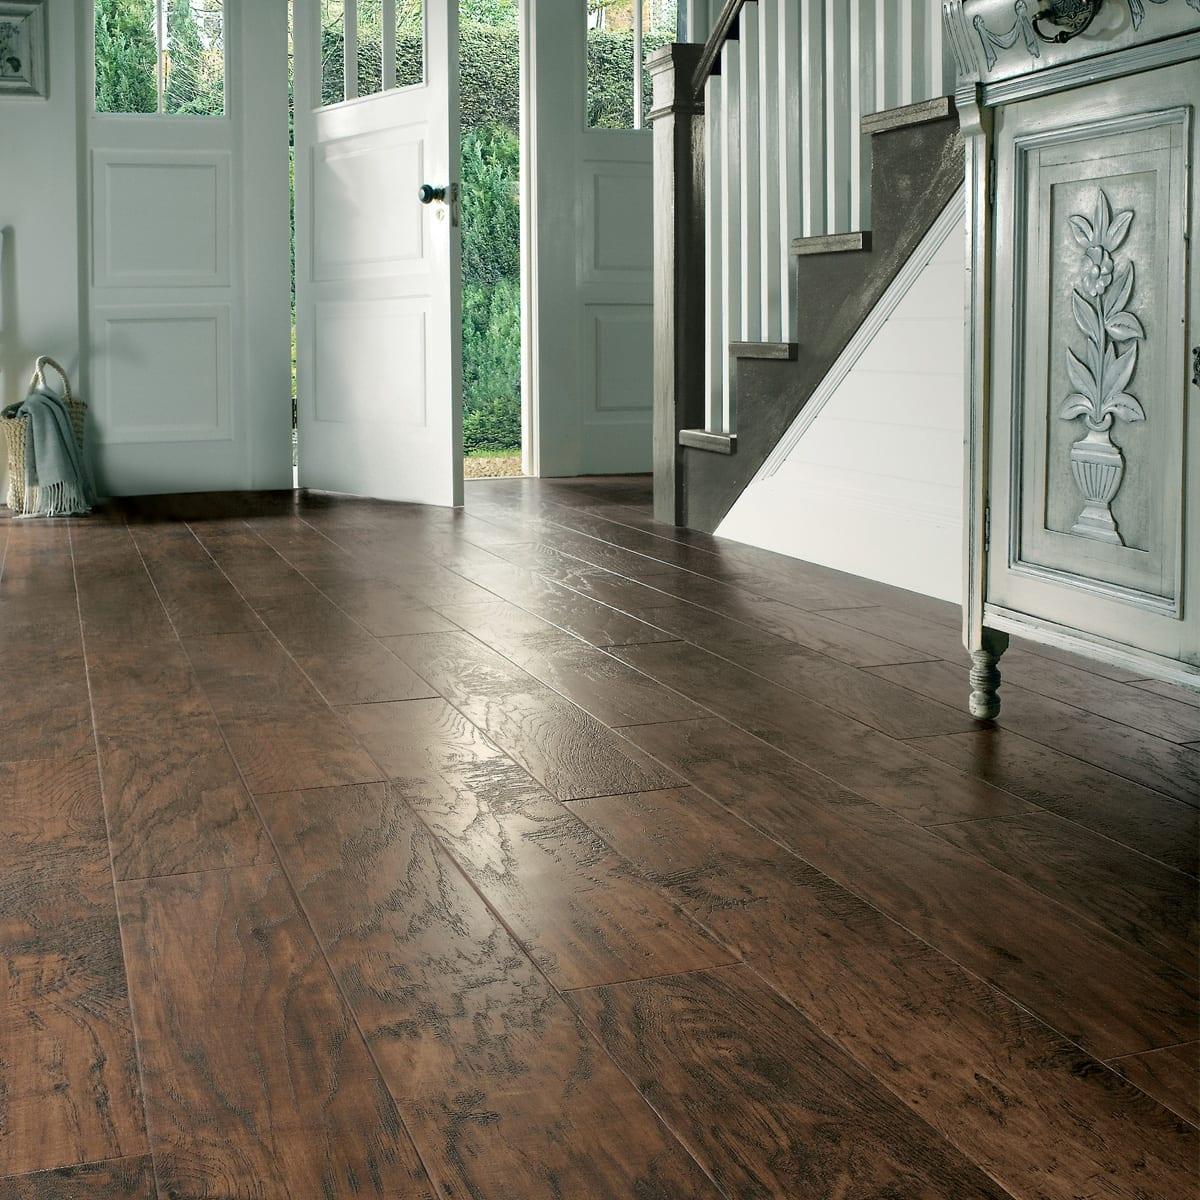 Karndean art select handcrafted vinyl plank flooring for Hard vinyl floor tiles